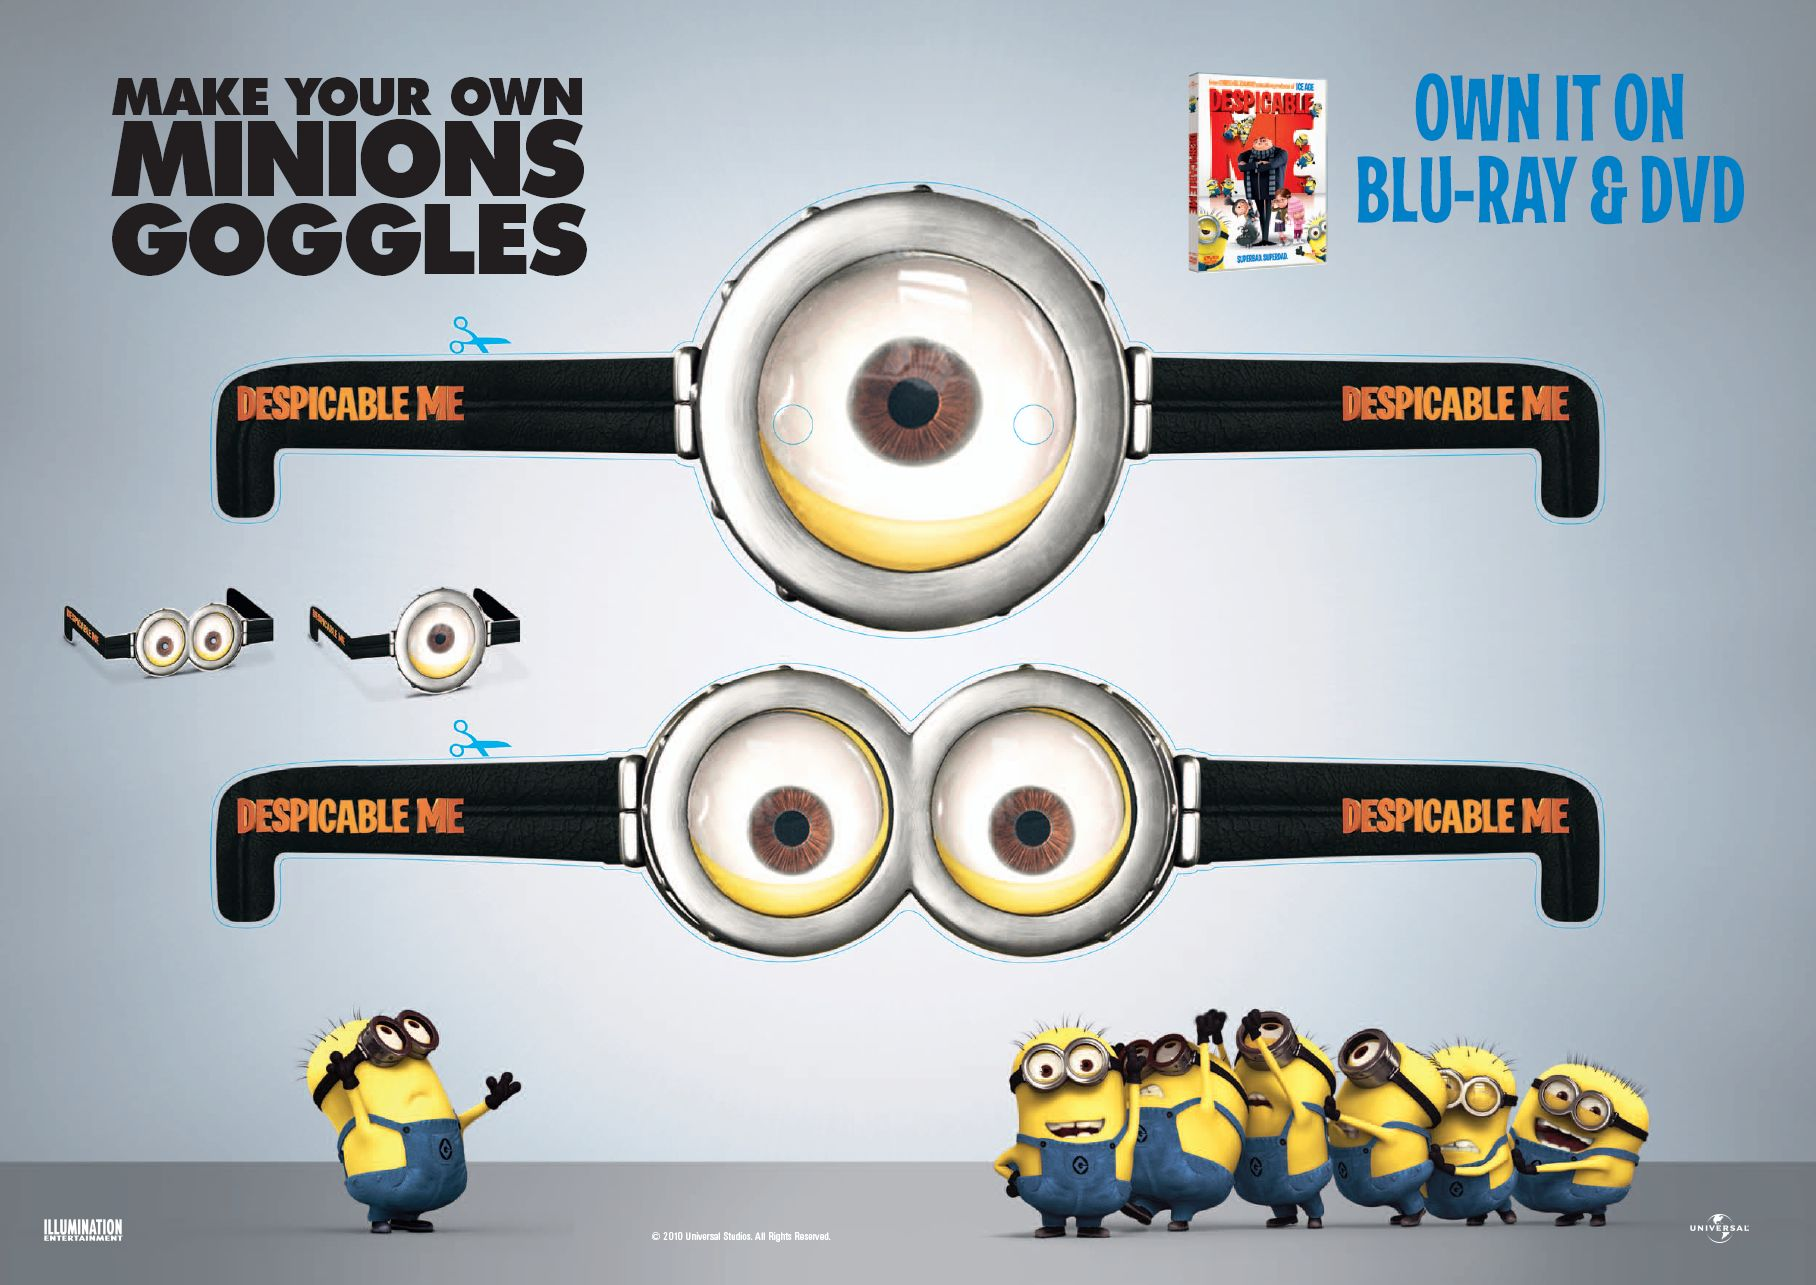 Funny Minions Goggles  Funny Minions Goggles